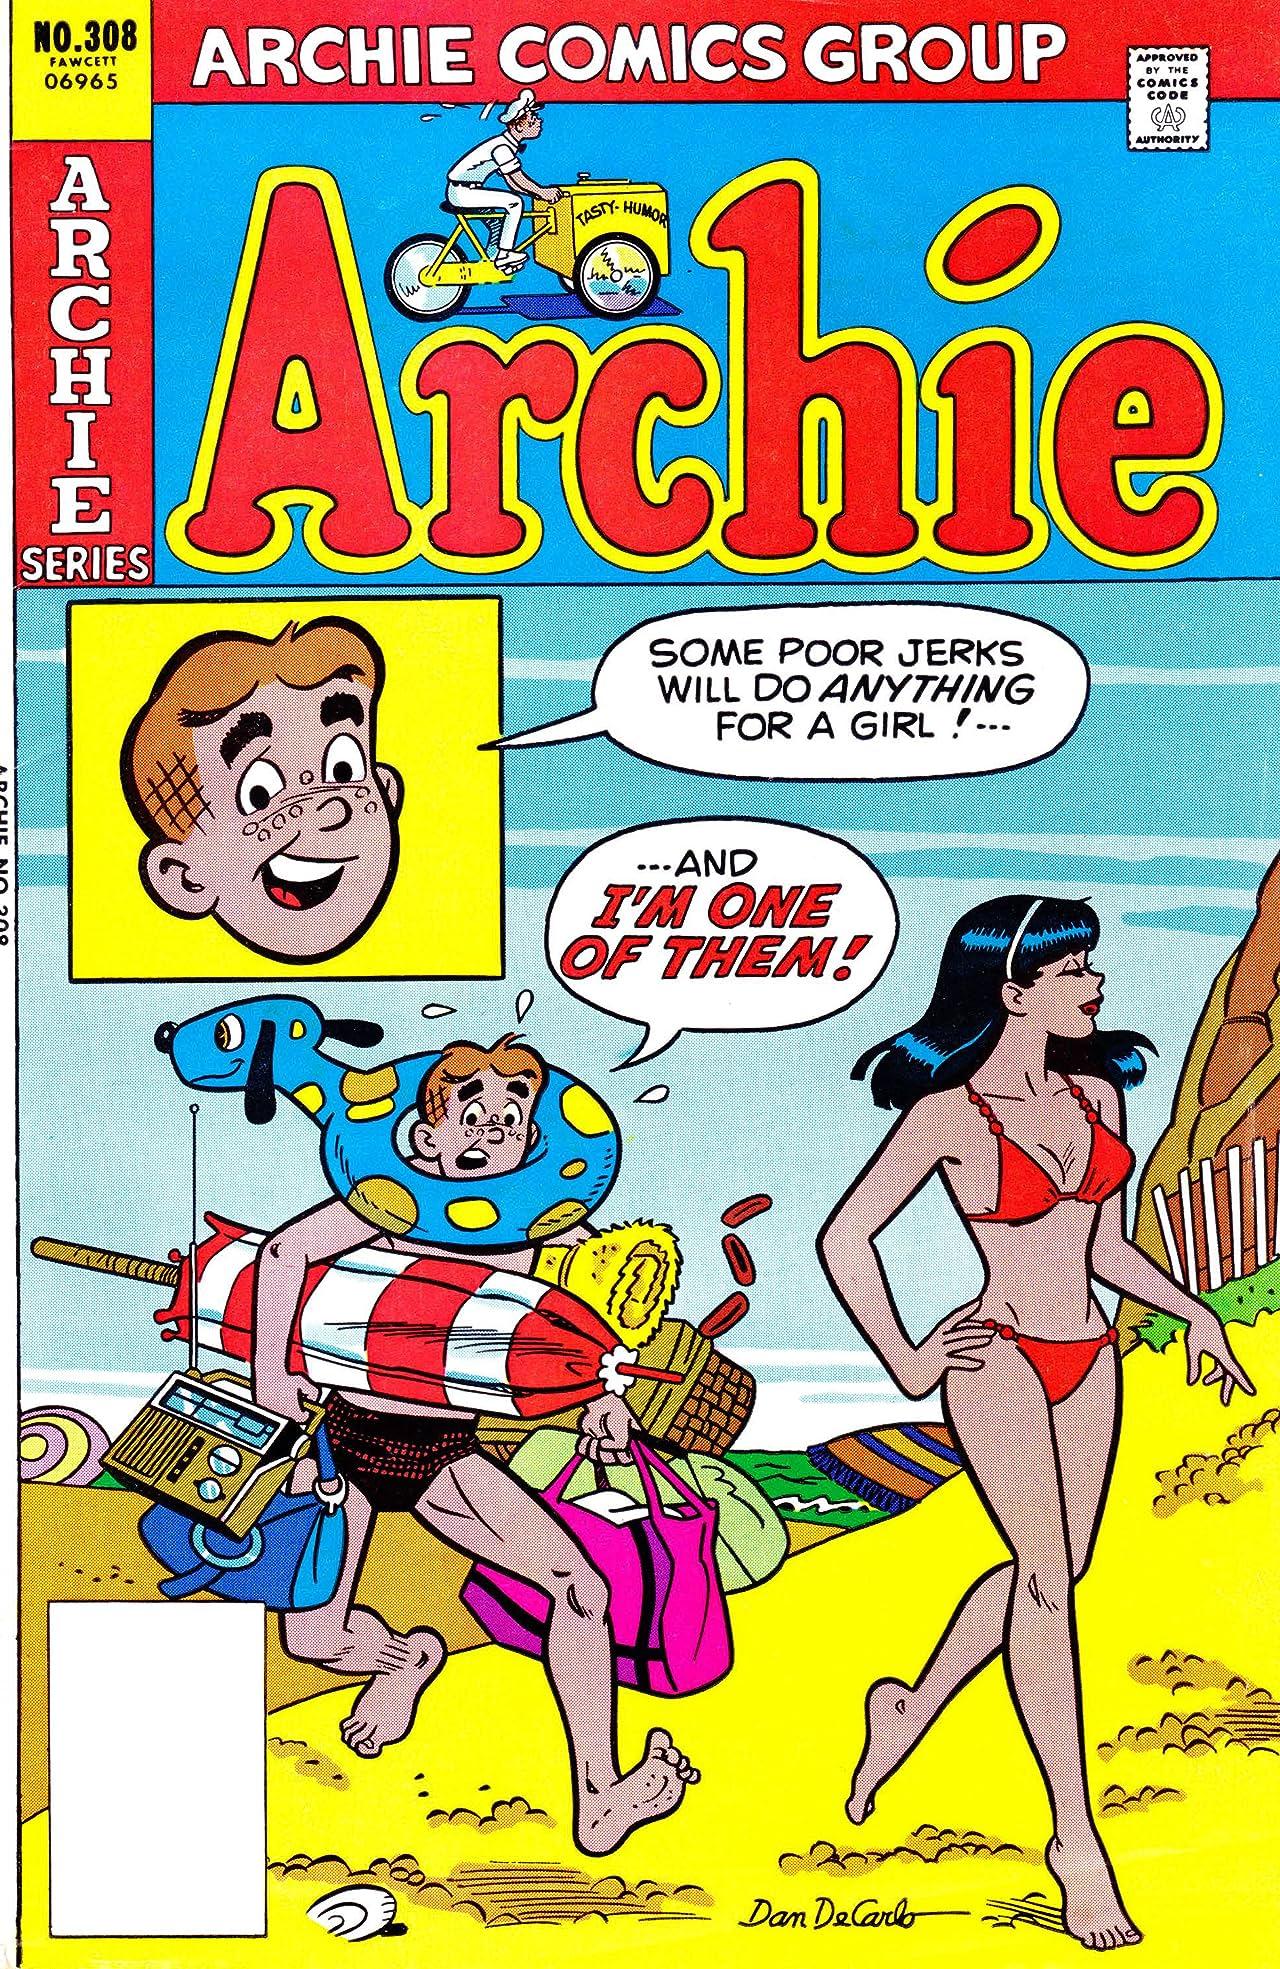 Archie #308